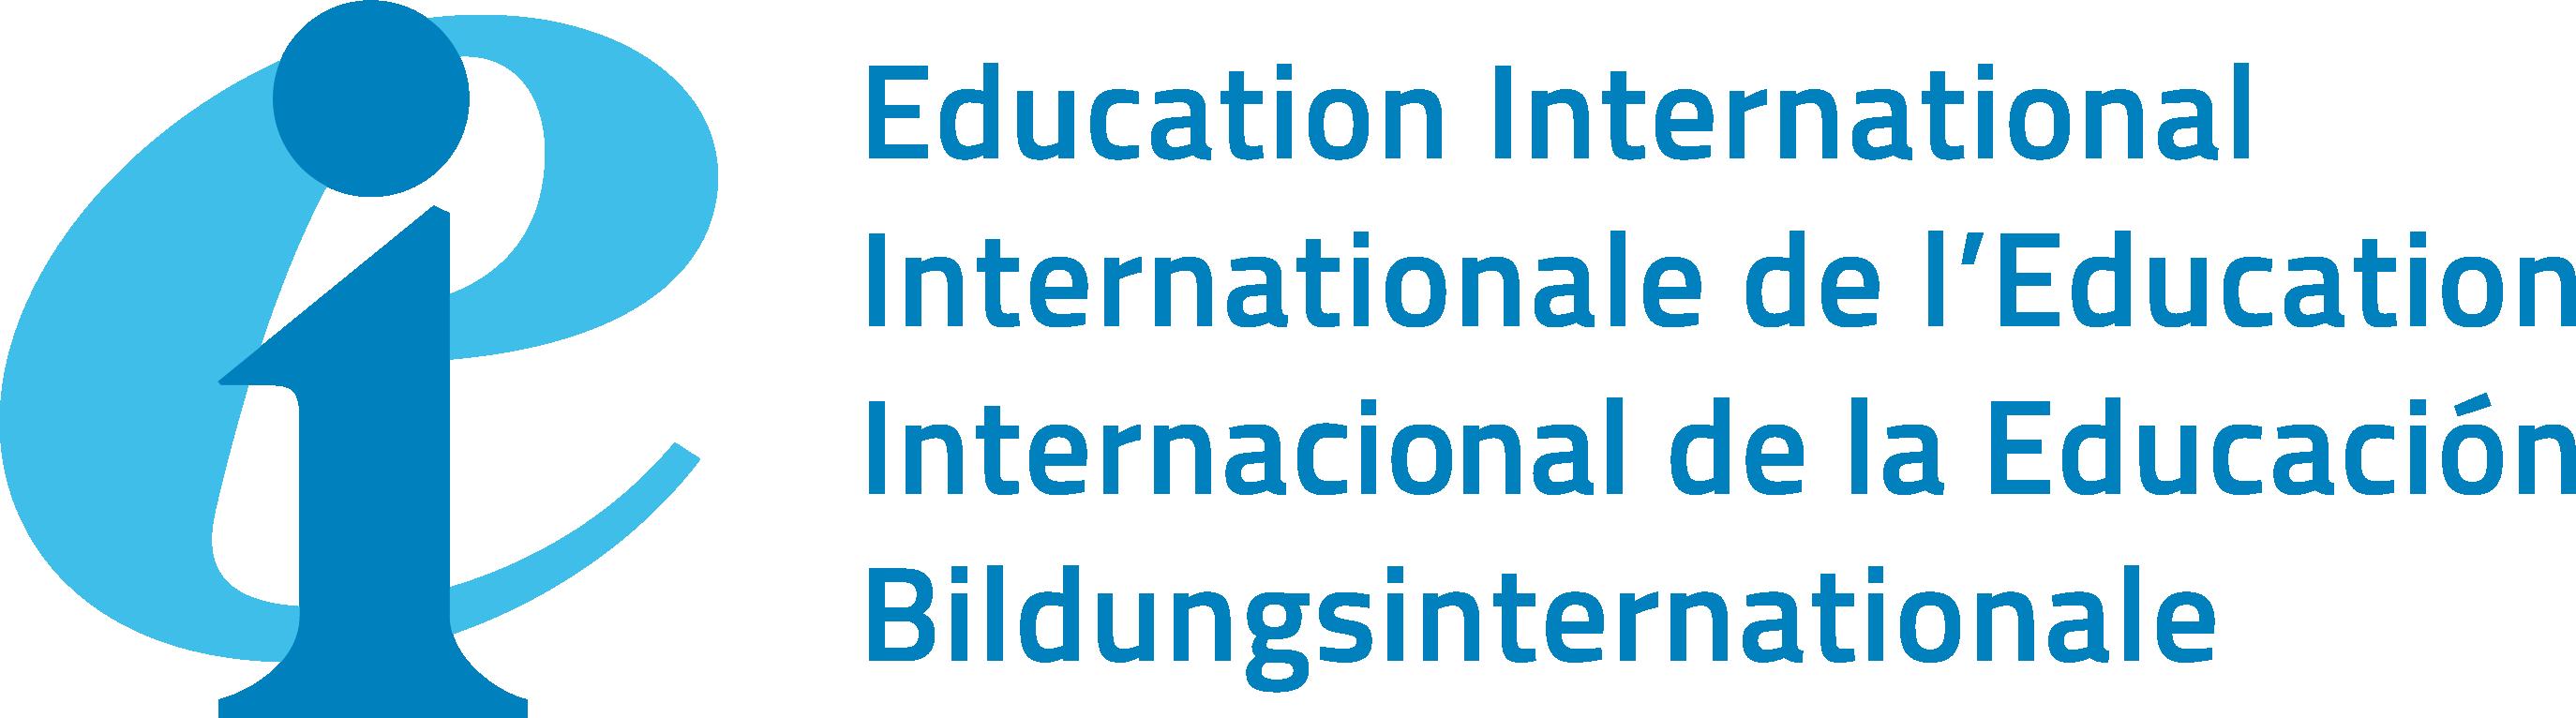 Education International LOGO